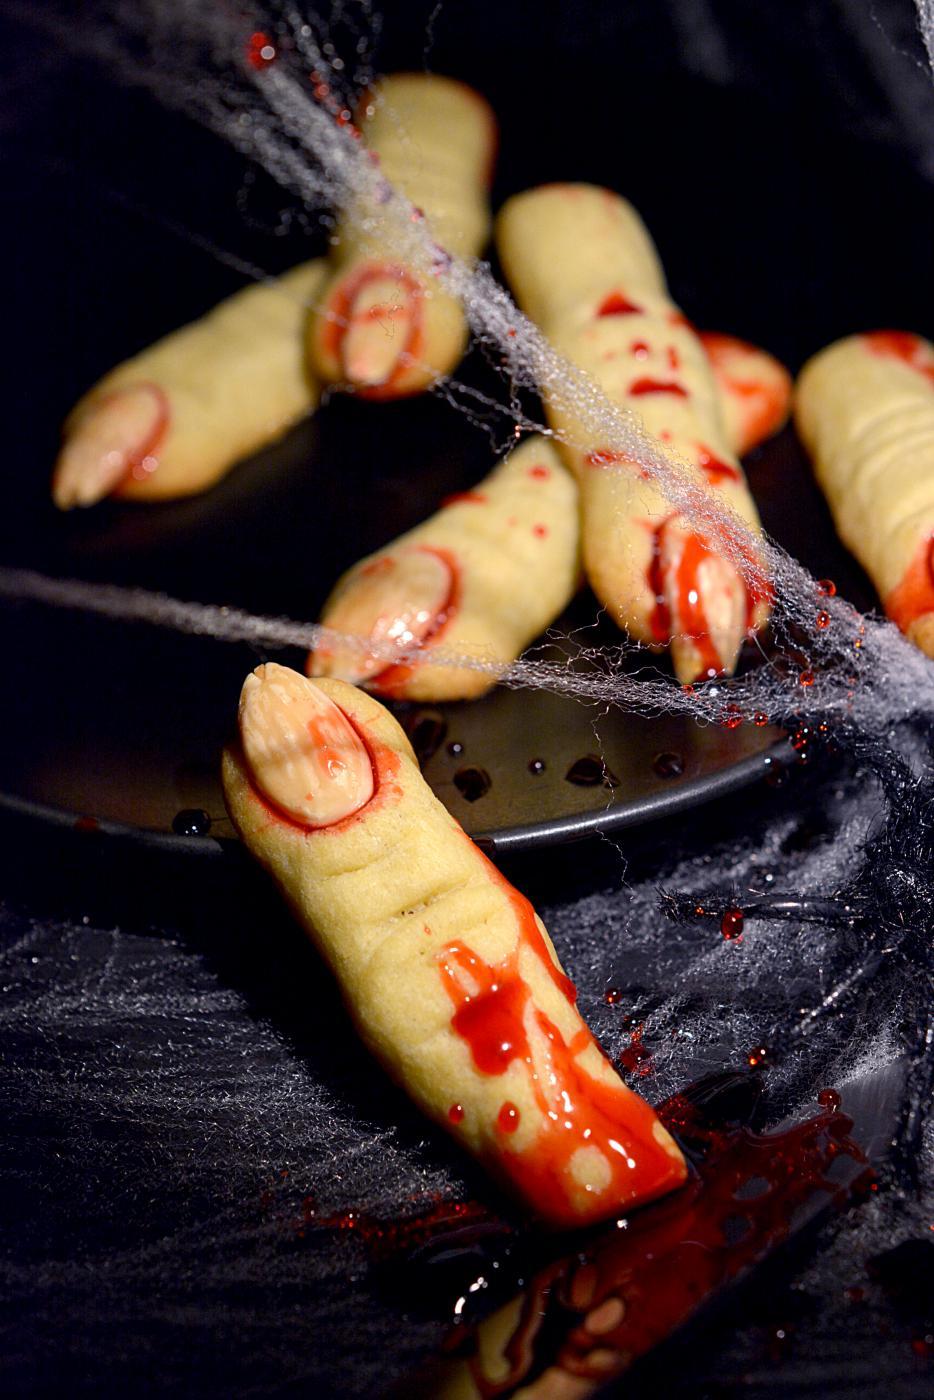 Halloween tulee, nyt sormet ristiin. K-18